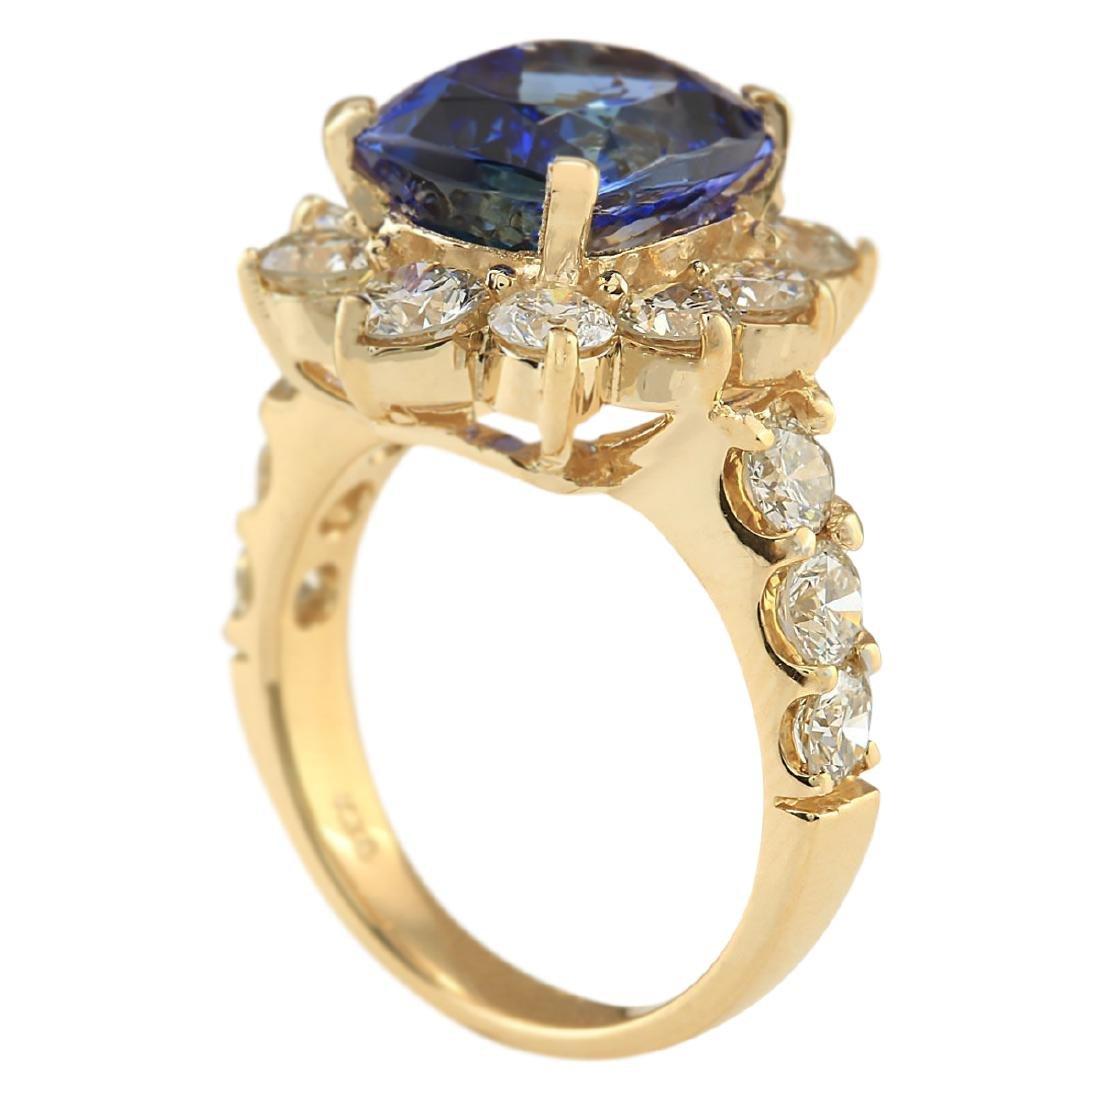 7.83 CTW Natural Tanzanite And Diamond Ring In 18K - 4